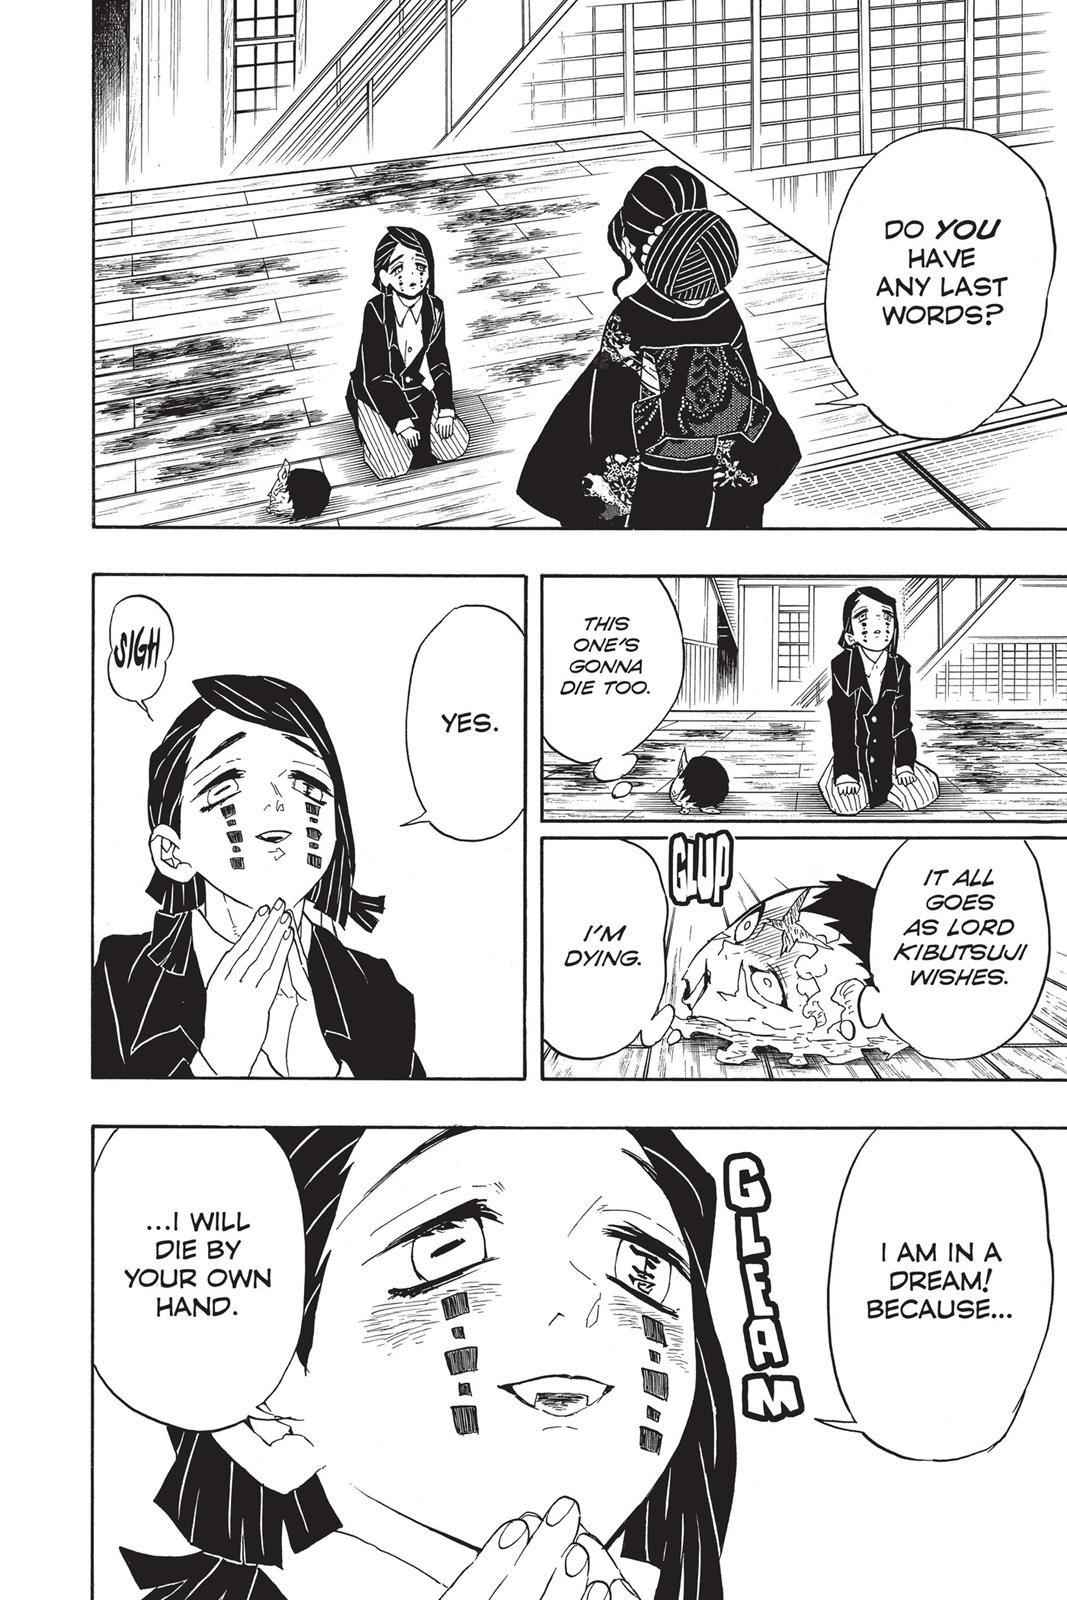 Kimetsu no Yaiba Chapter 52 Page 14 in 2020 Chapter